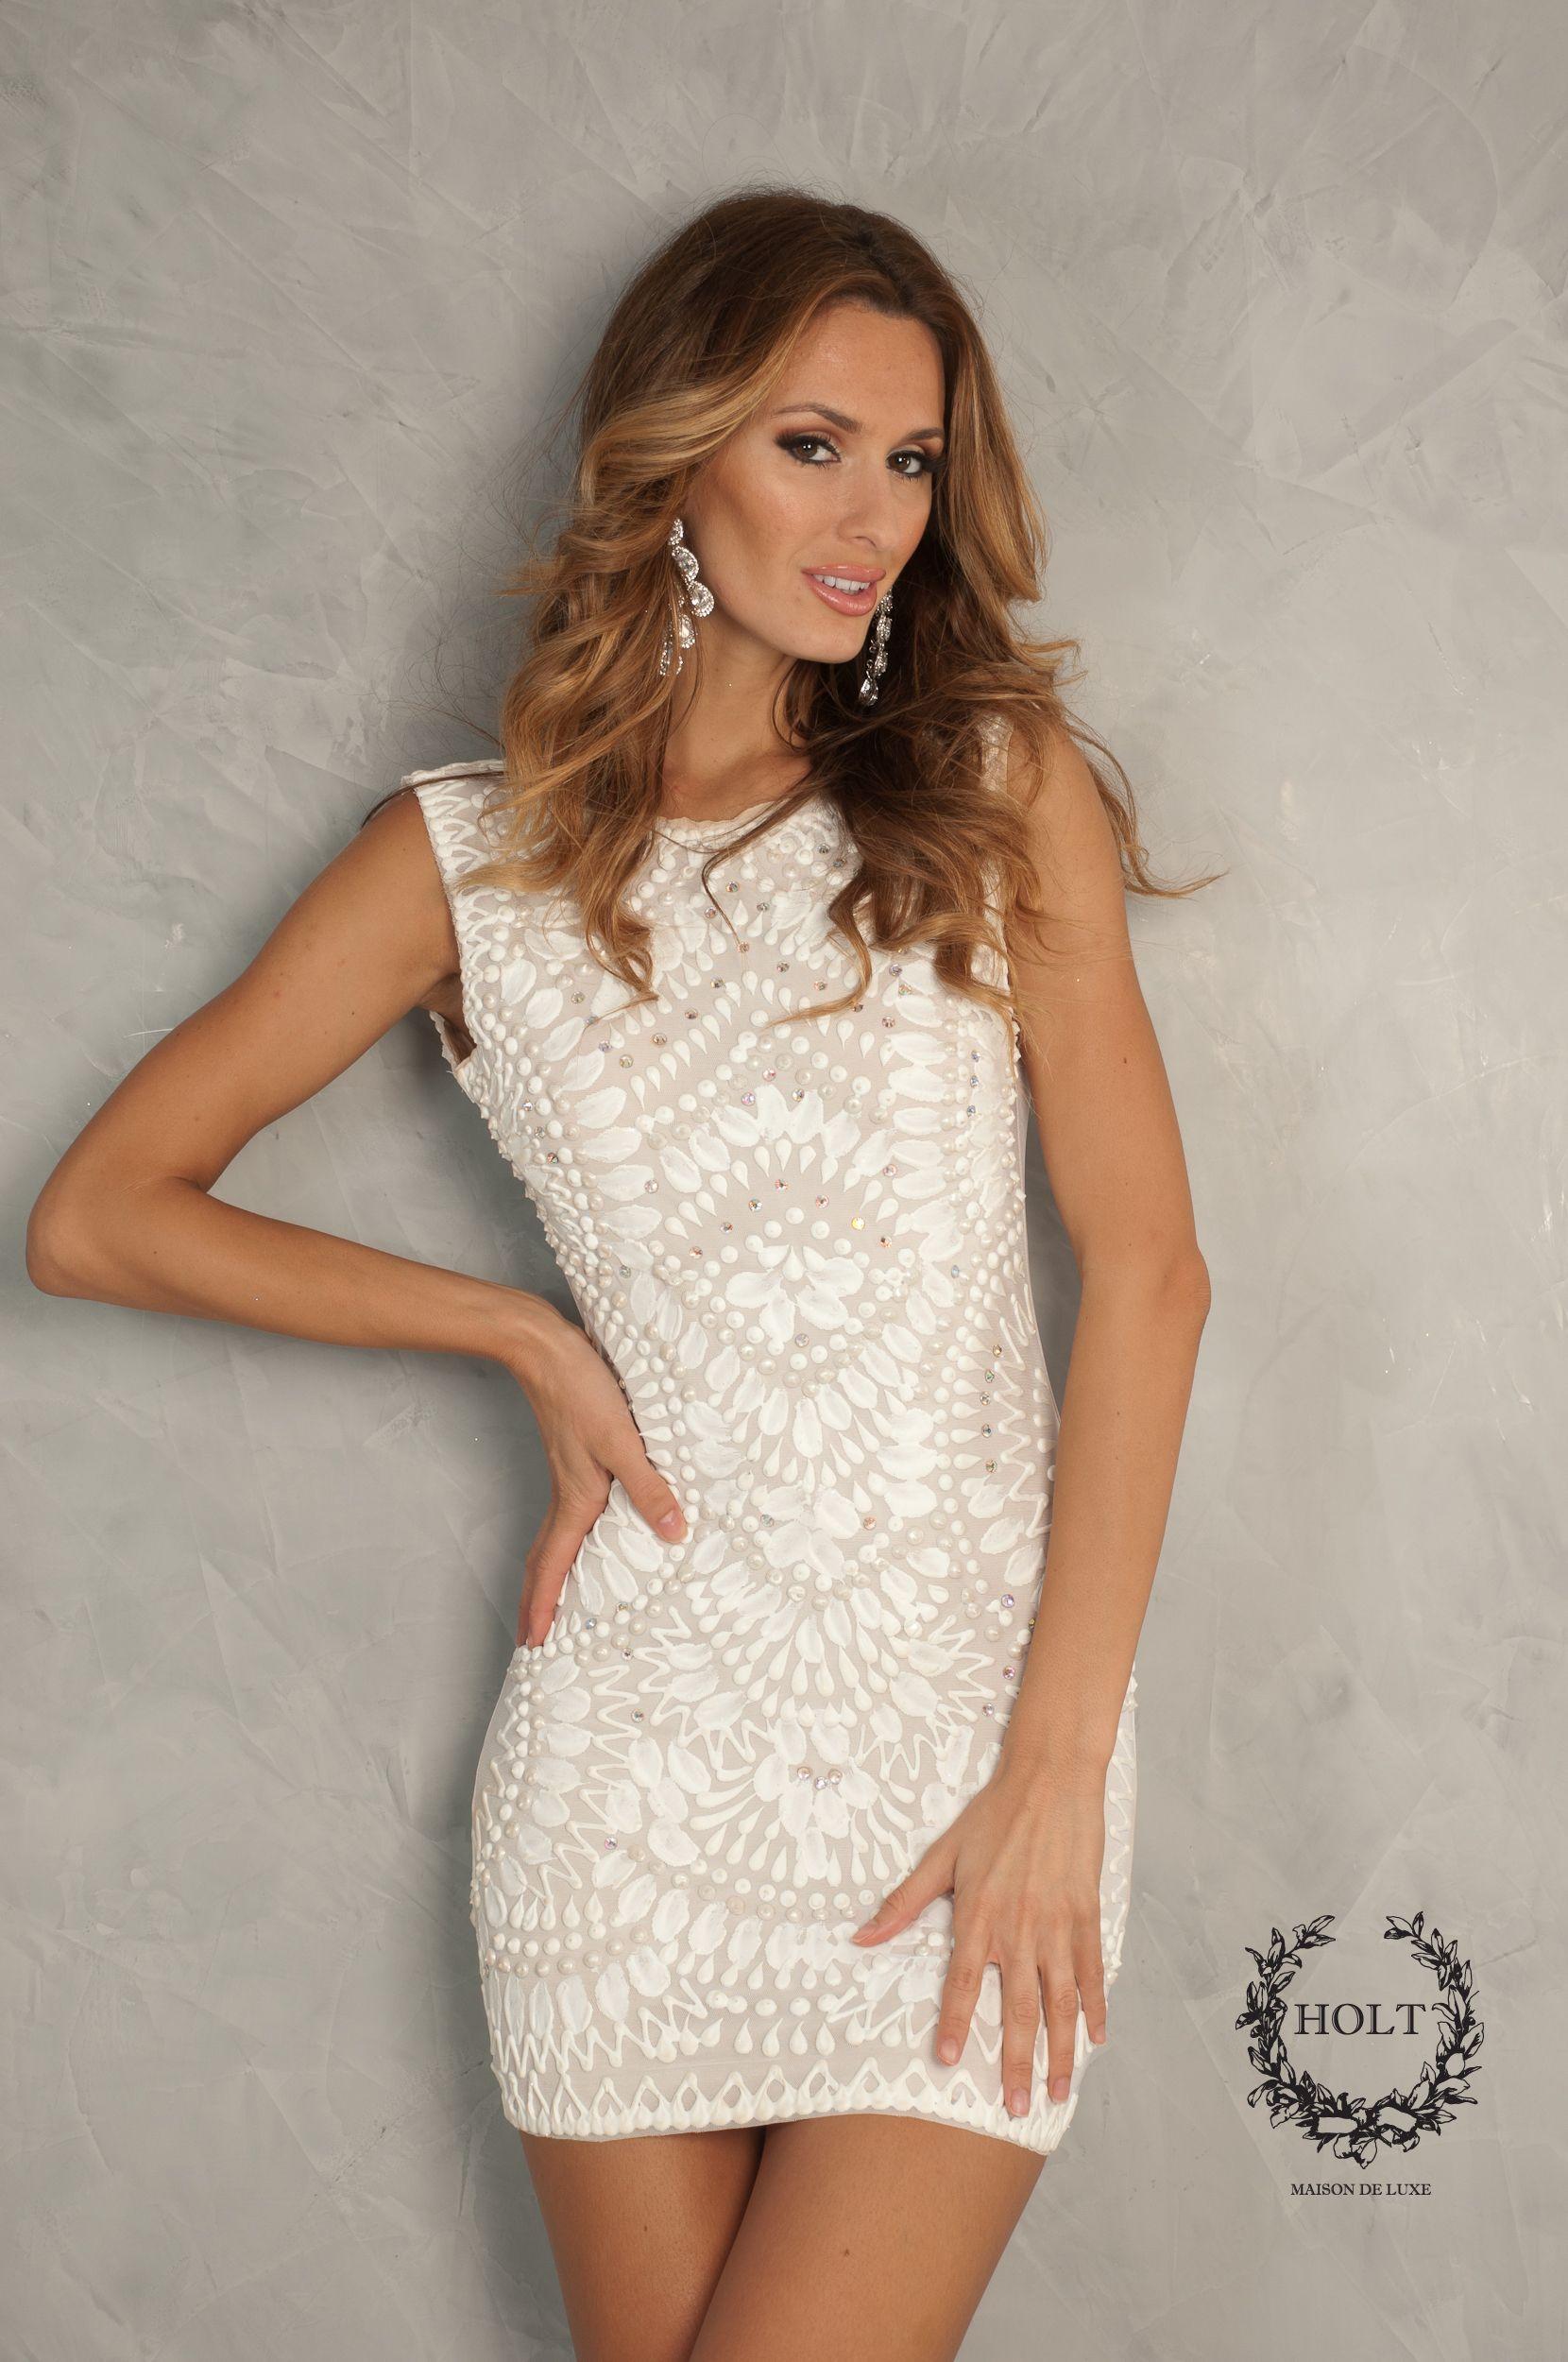 HOLT WWW.THEHOLTSTORE.COM | LIA DRESSES BY HOLT | Pinterest | Mode ...